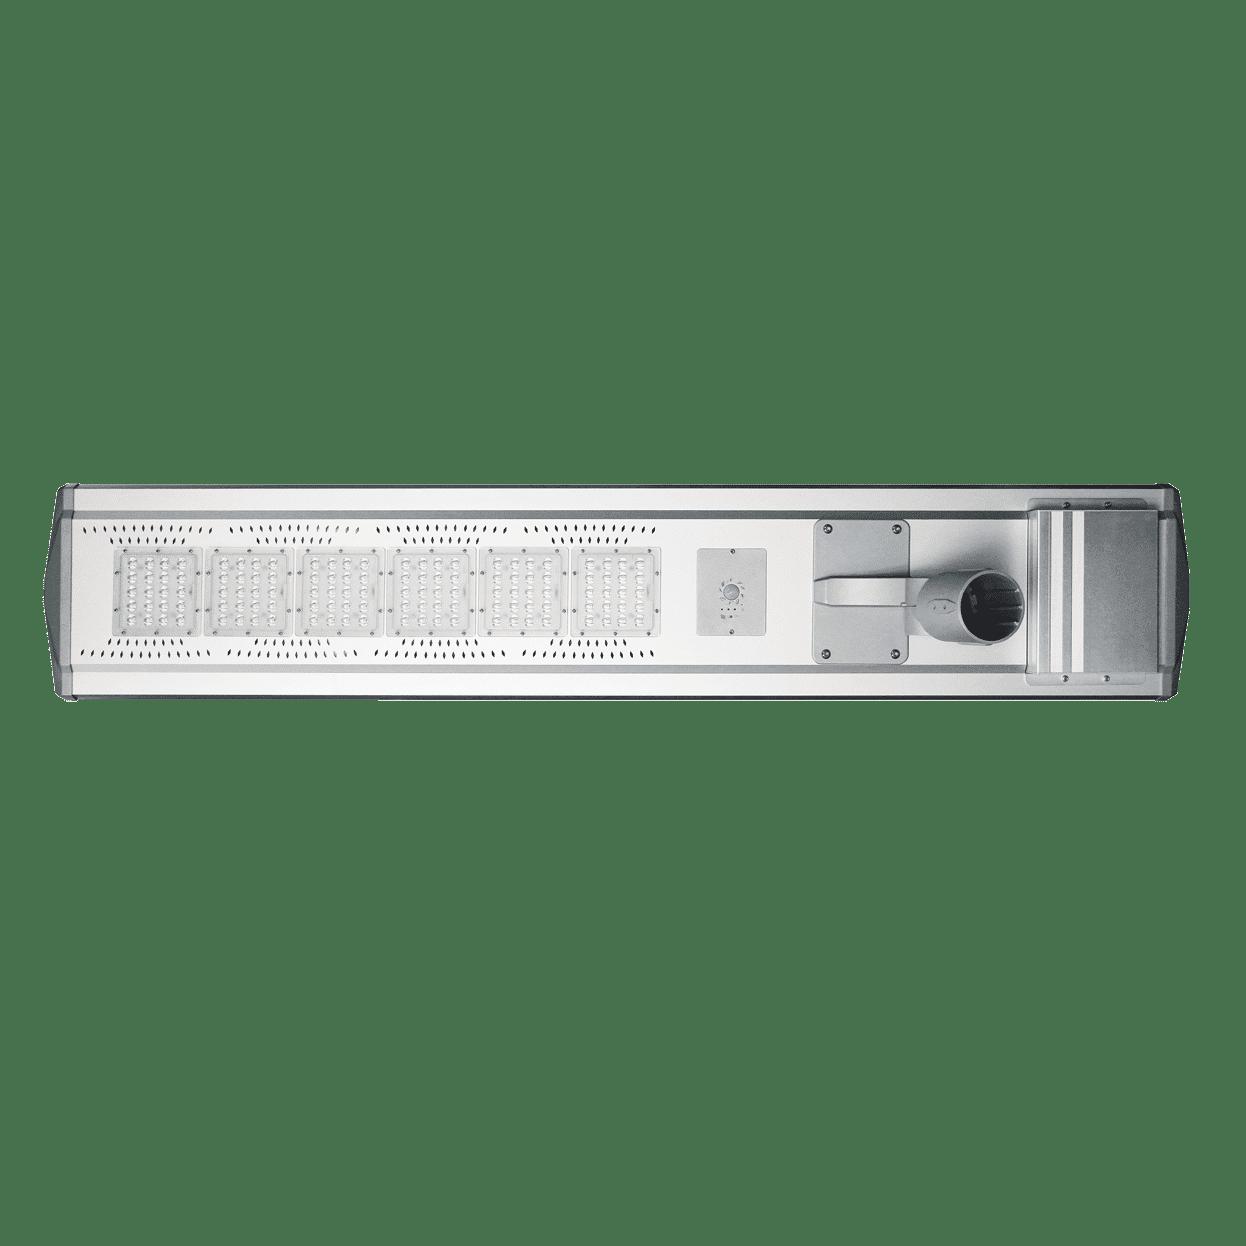 Solar LED Street Light bottom view 5050 S3 series 100W